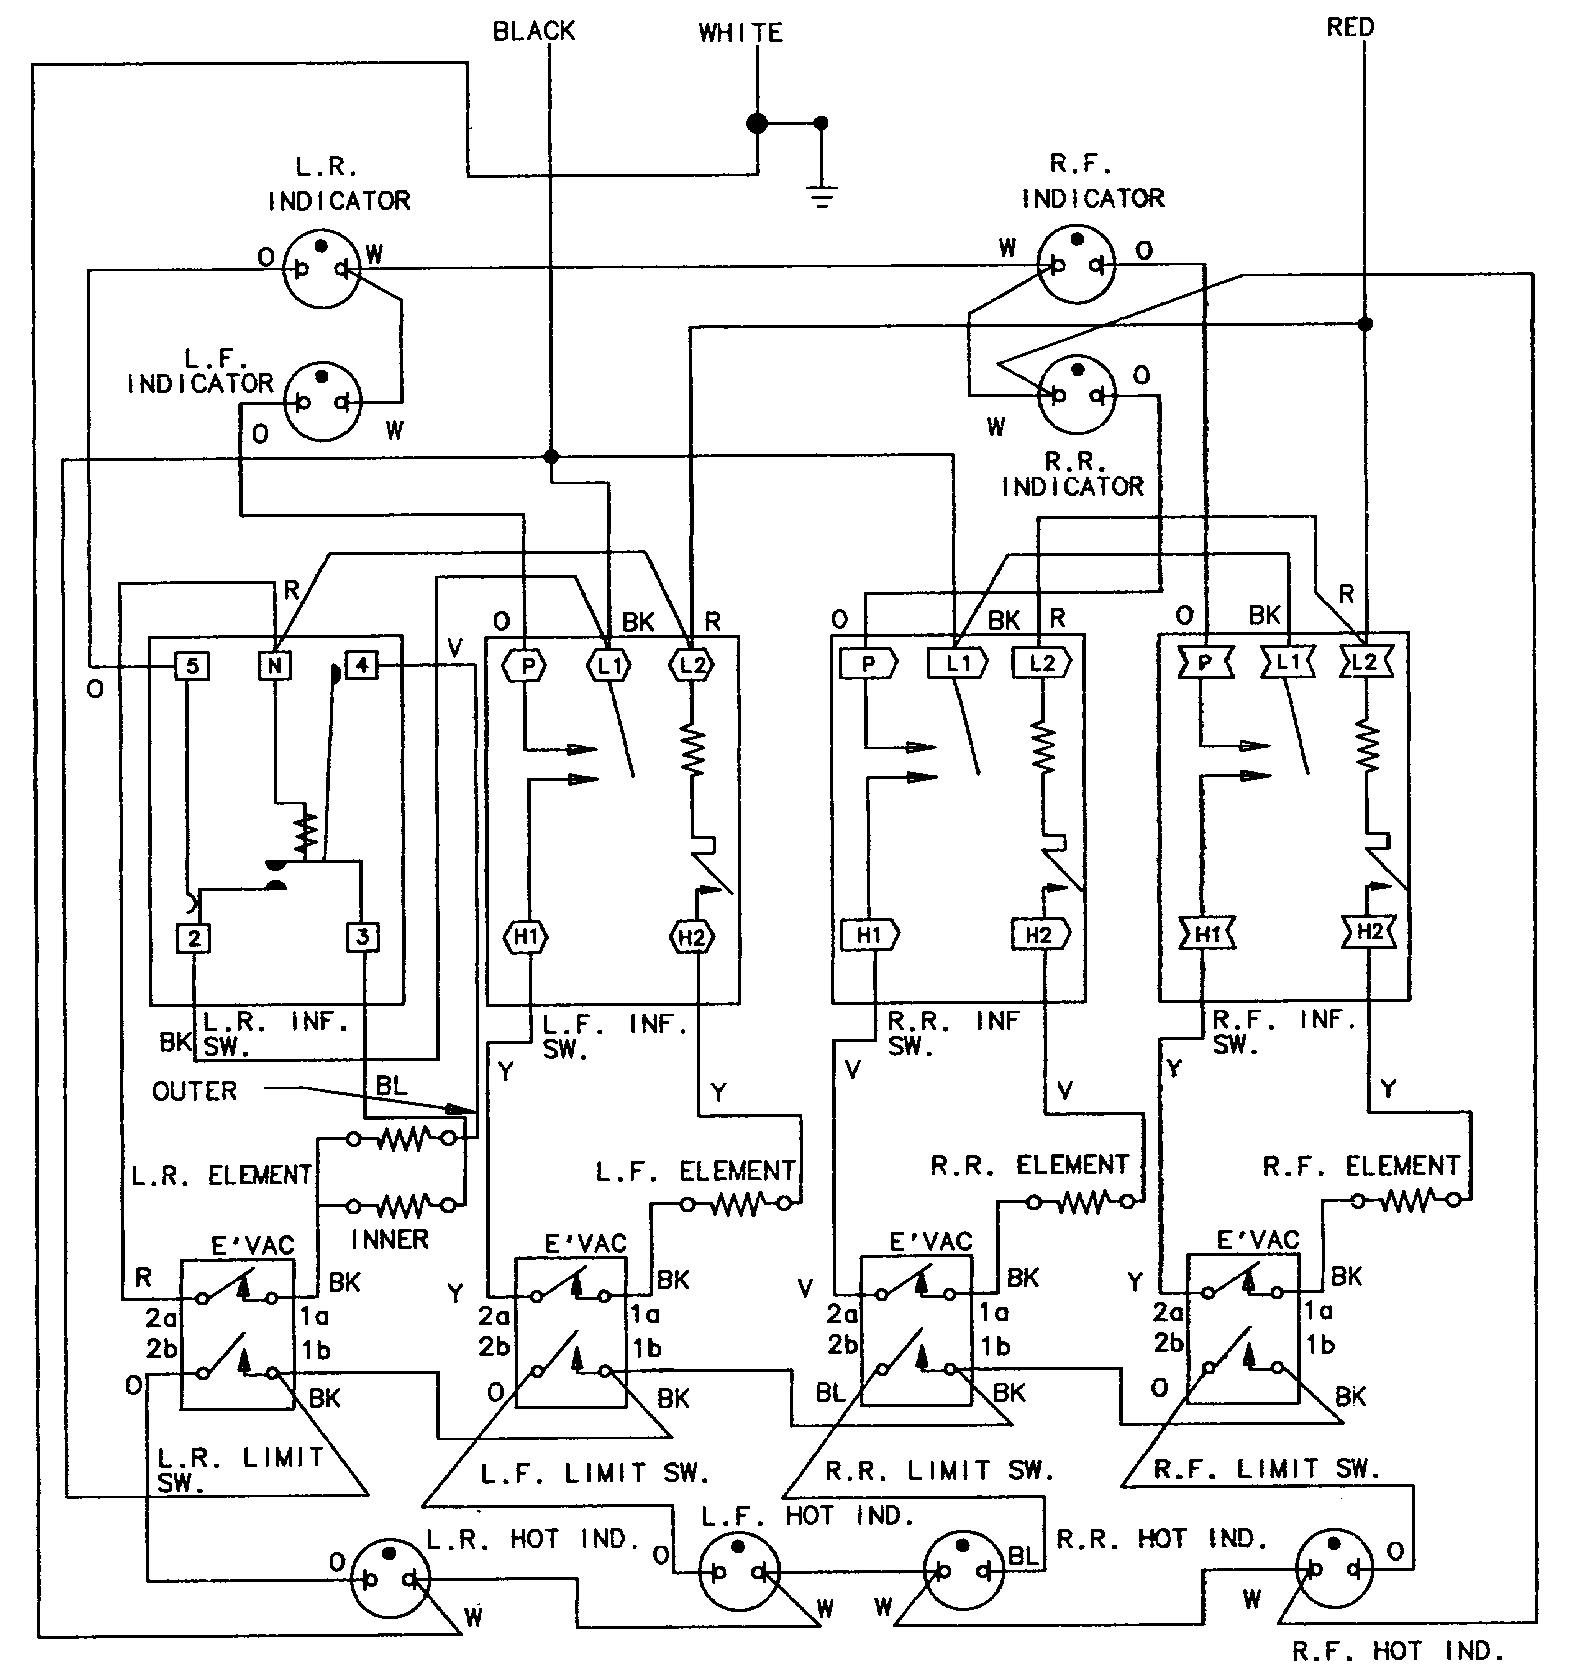 jenn air wiring diagram jenn air wiring diagram wiring diagram megajenn air wiring diagram wiring diagram [ 1576 x 1679 Pixel ]